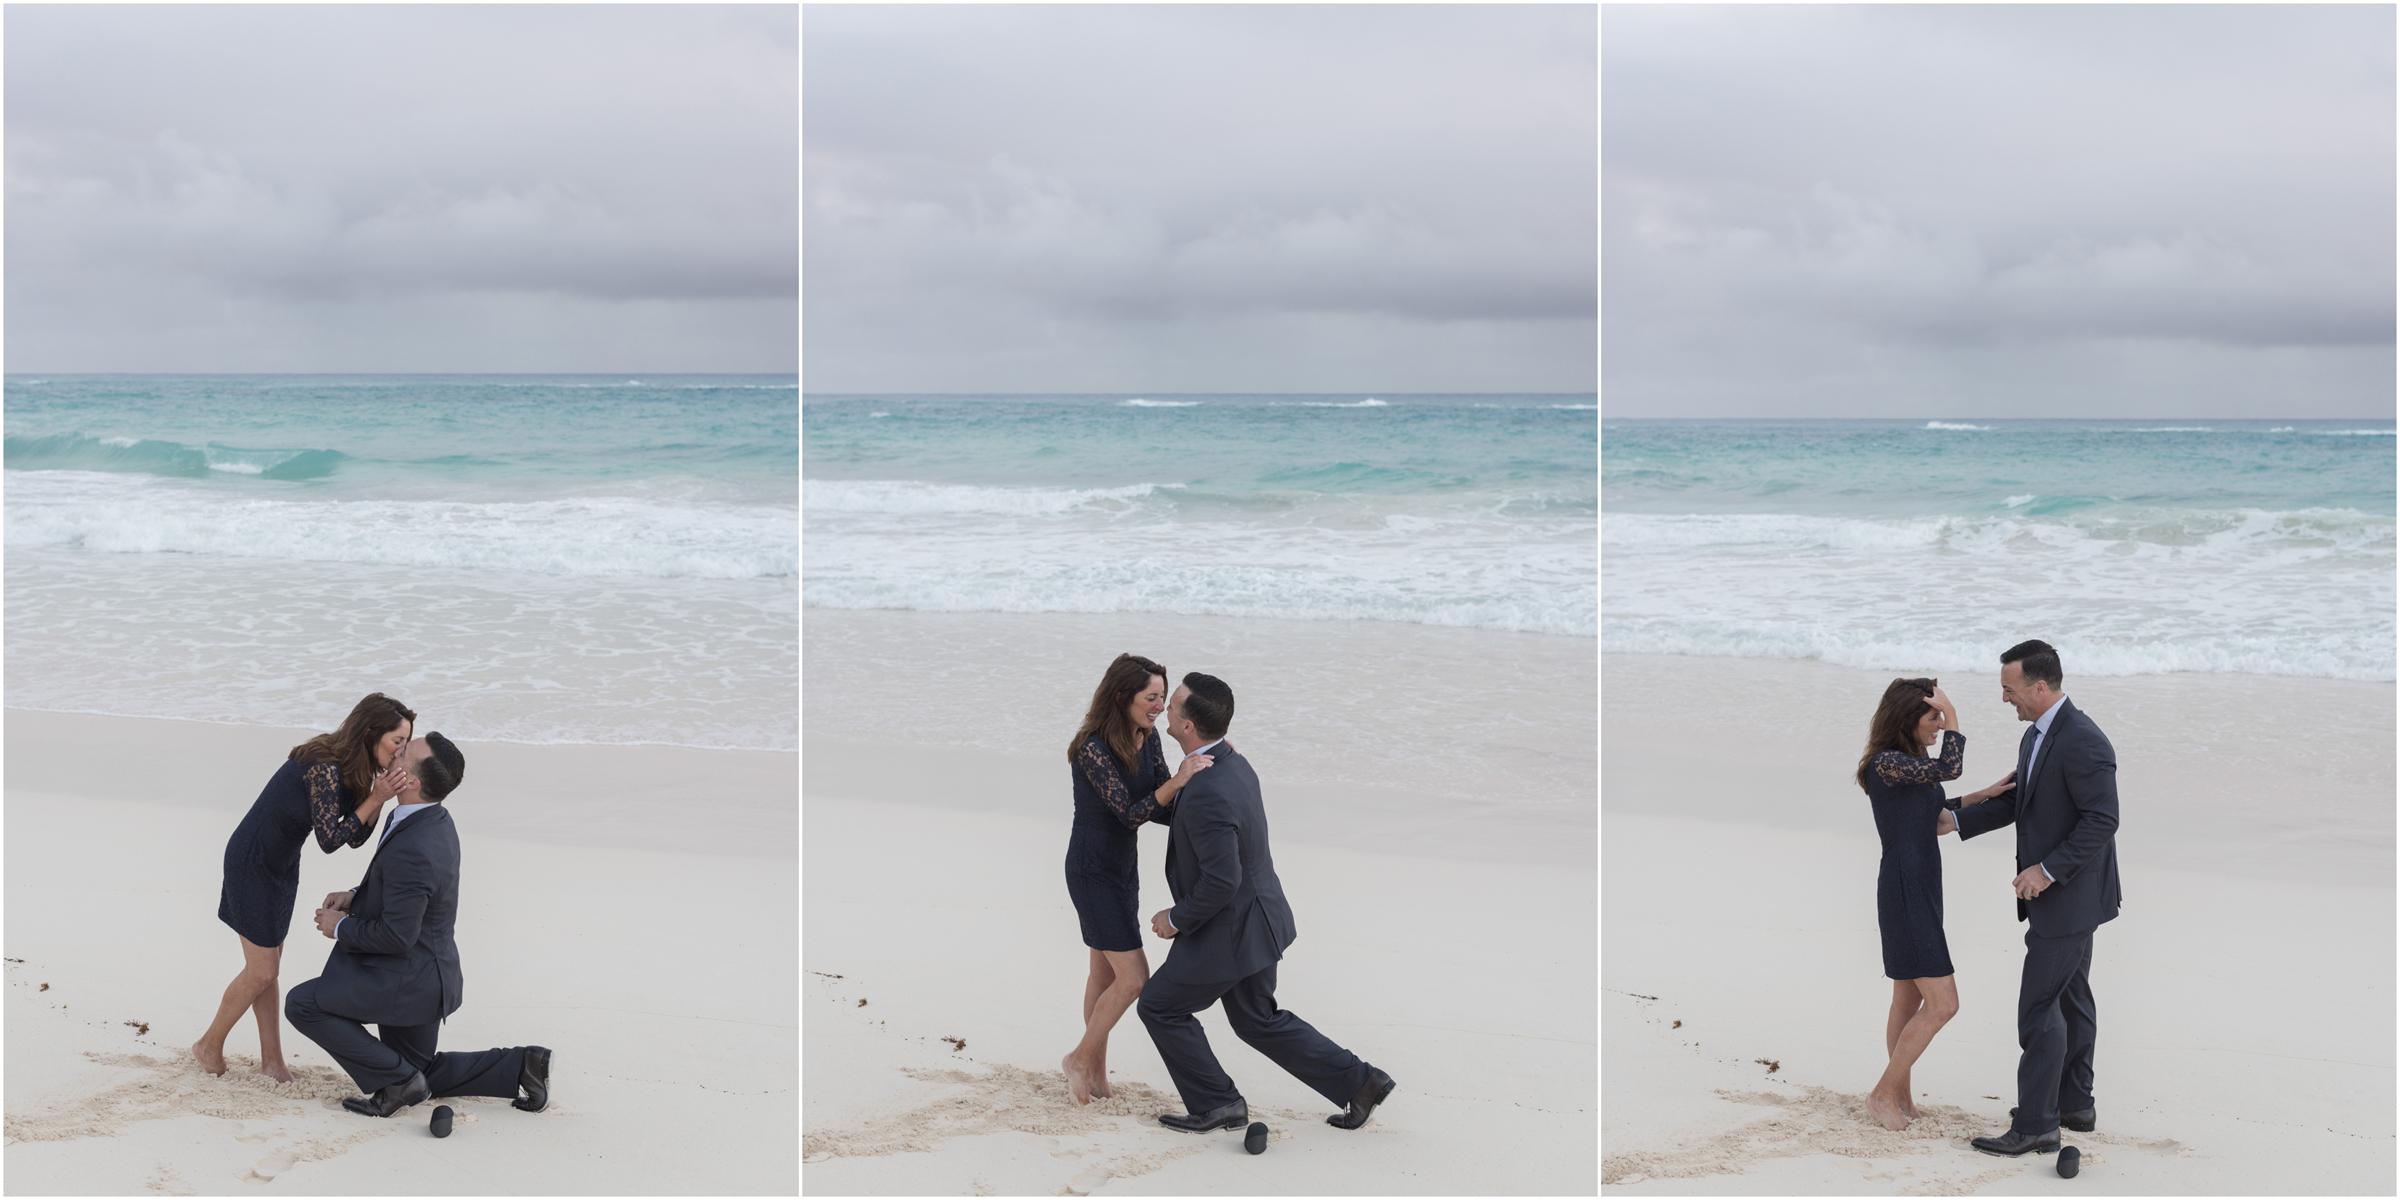 ©FianderFoto_Engagement_Doug_Mary_5.jpg